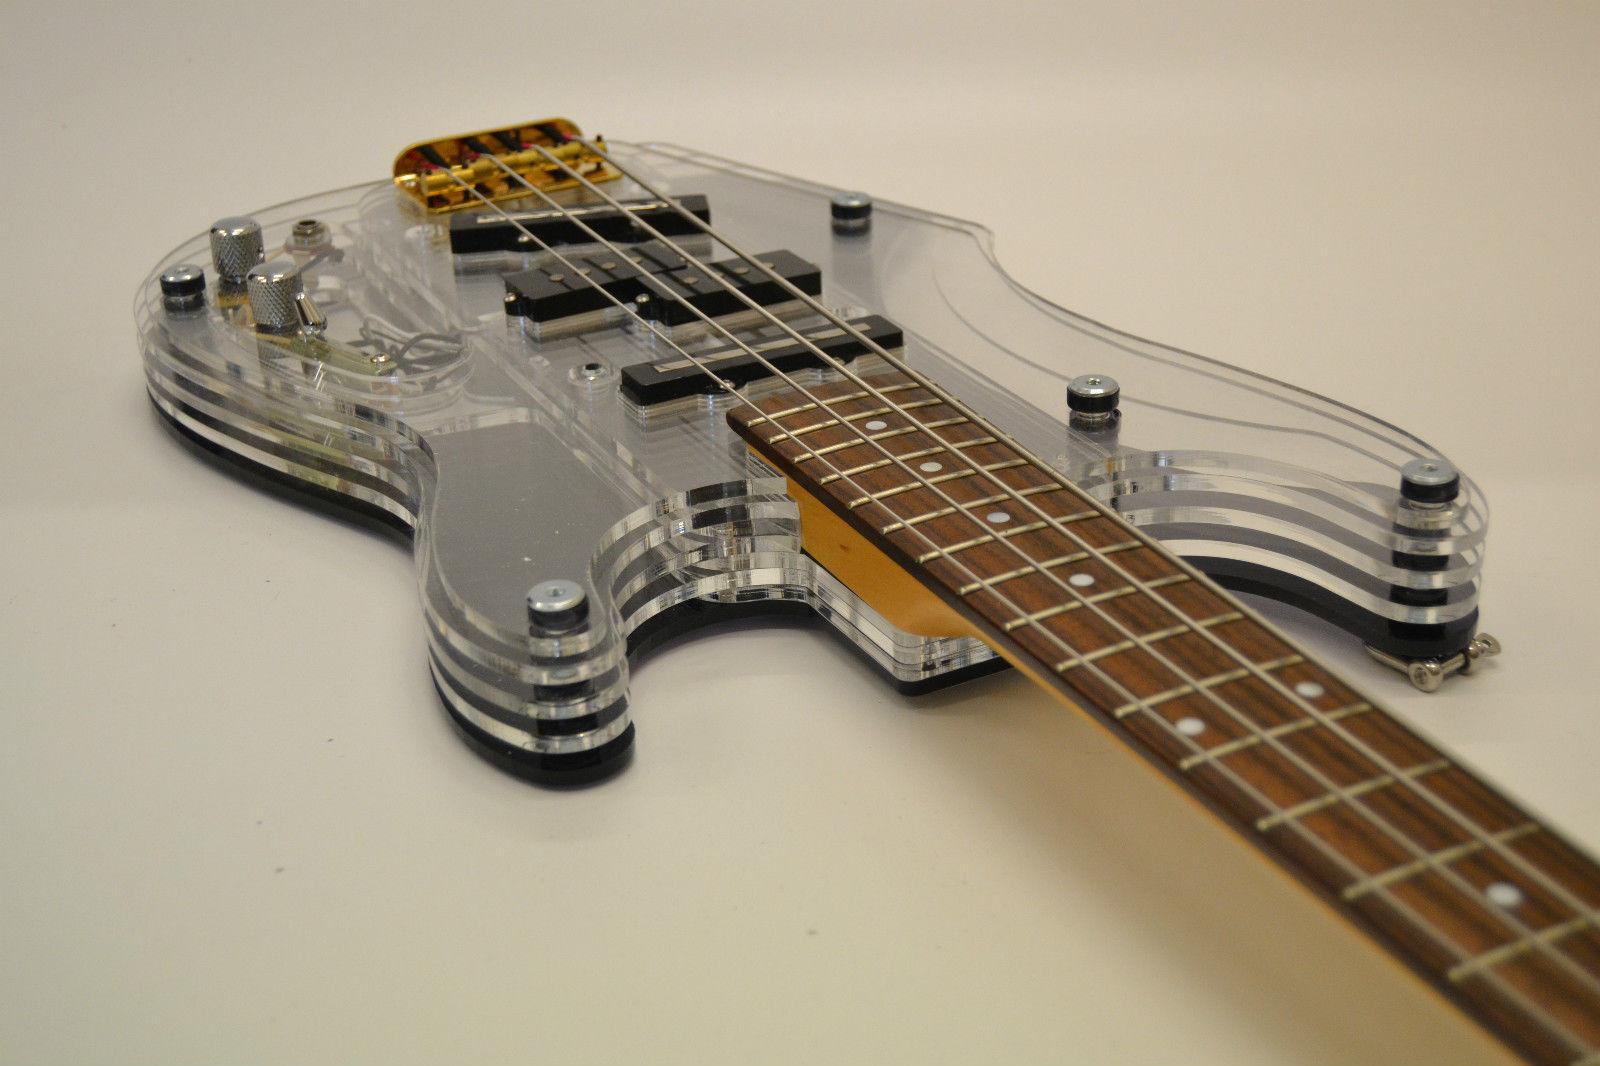 guitar blog layer guitars acrylic bodied bass guitar. Black Bedroom Furniture Sets. Home Design Ideas